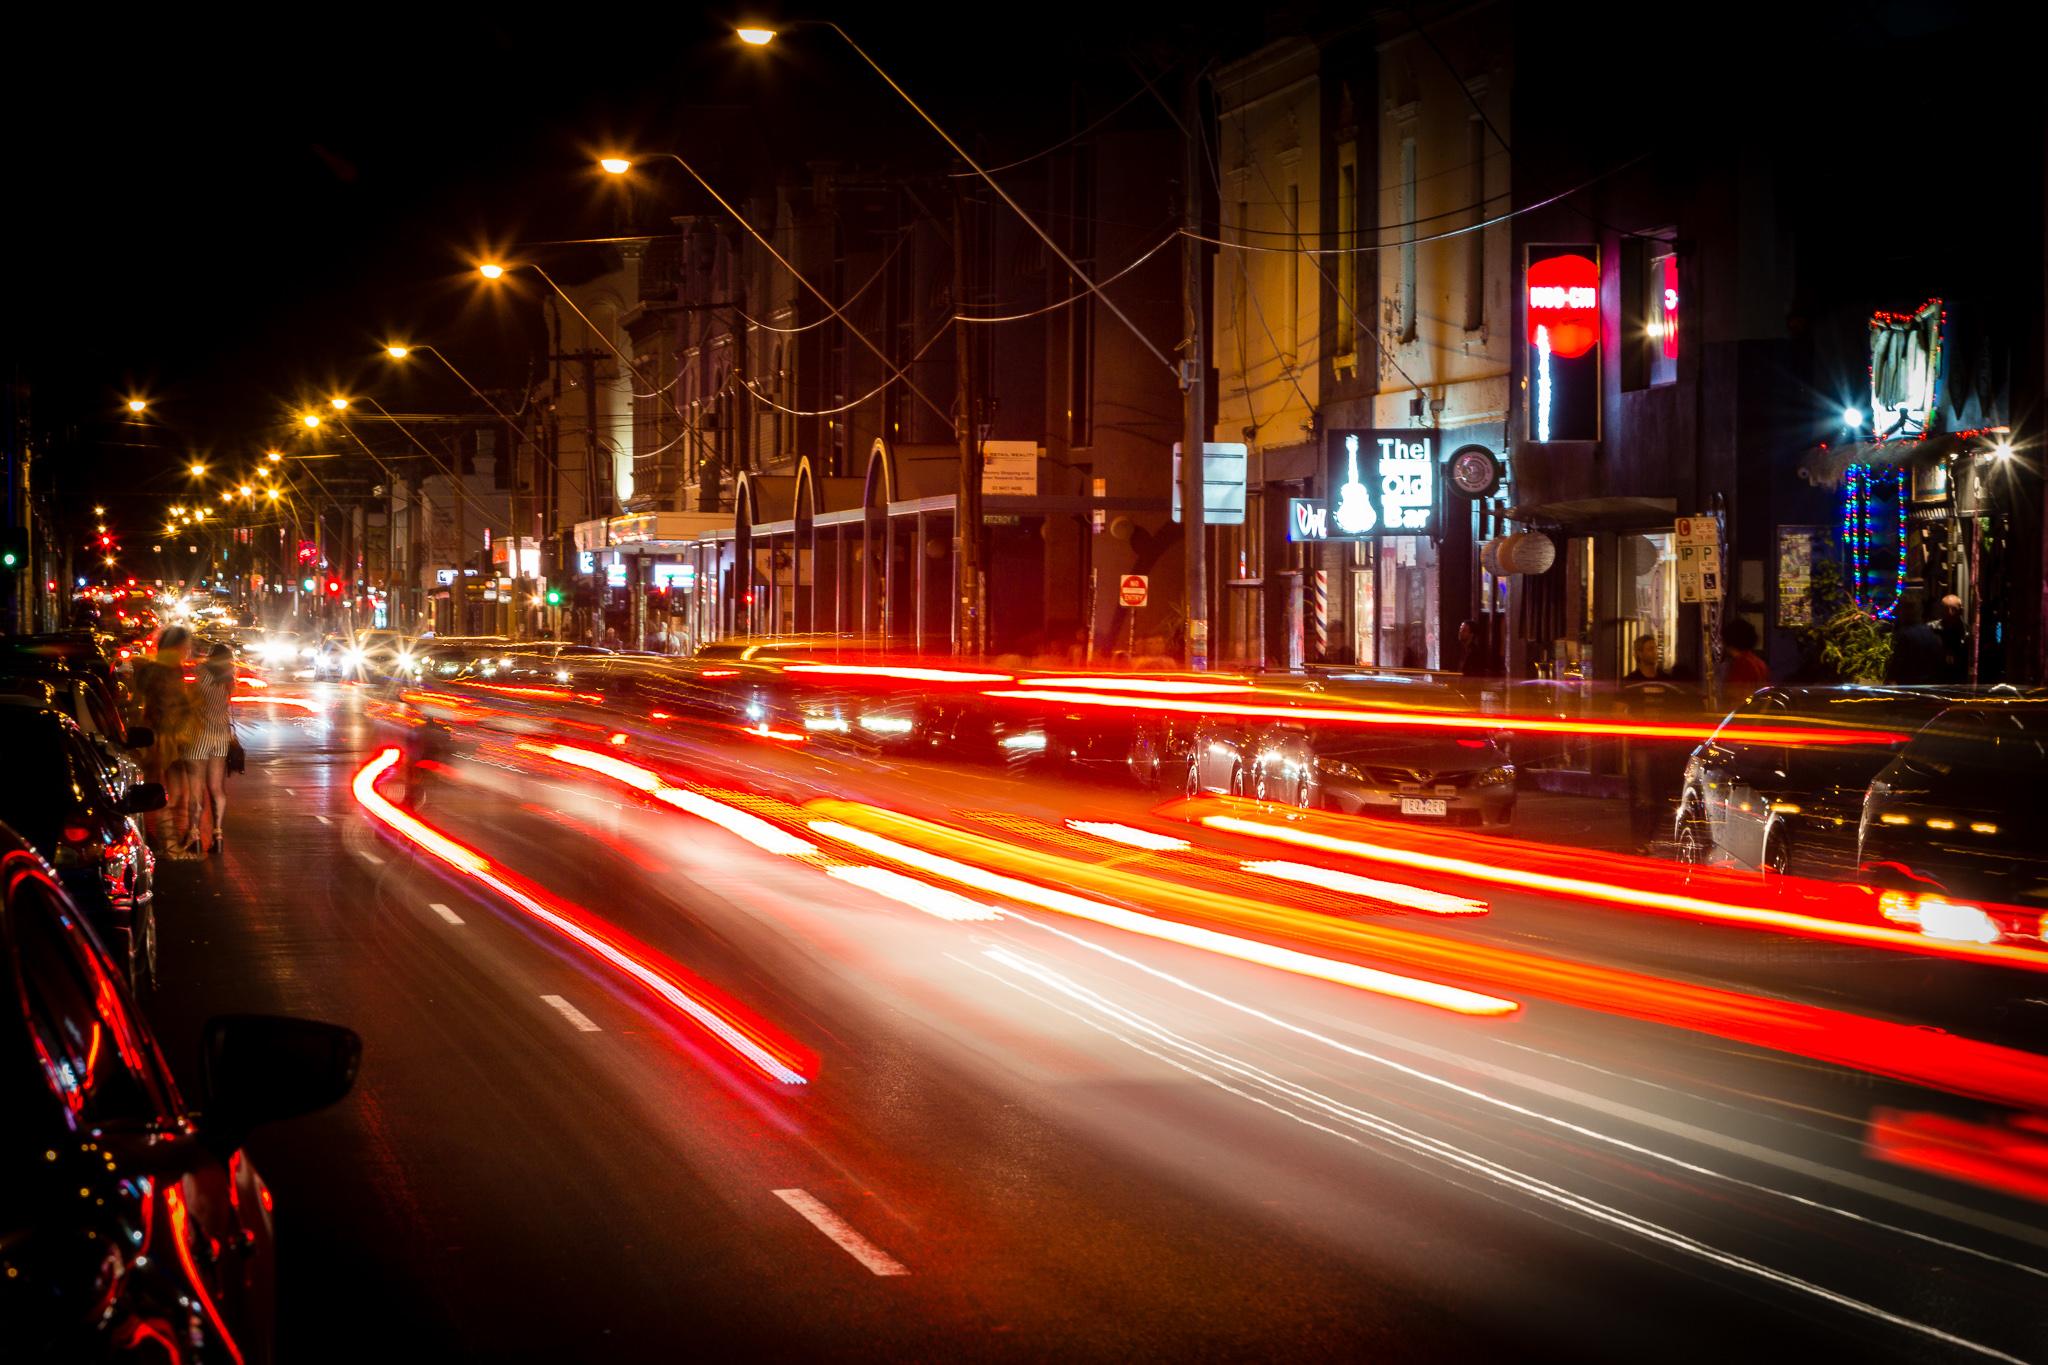 Johnston St at night